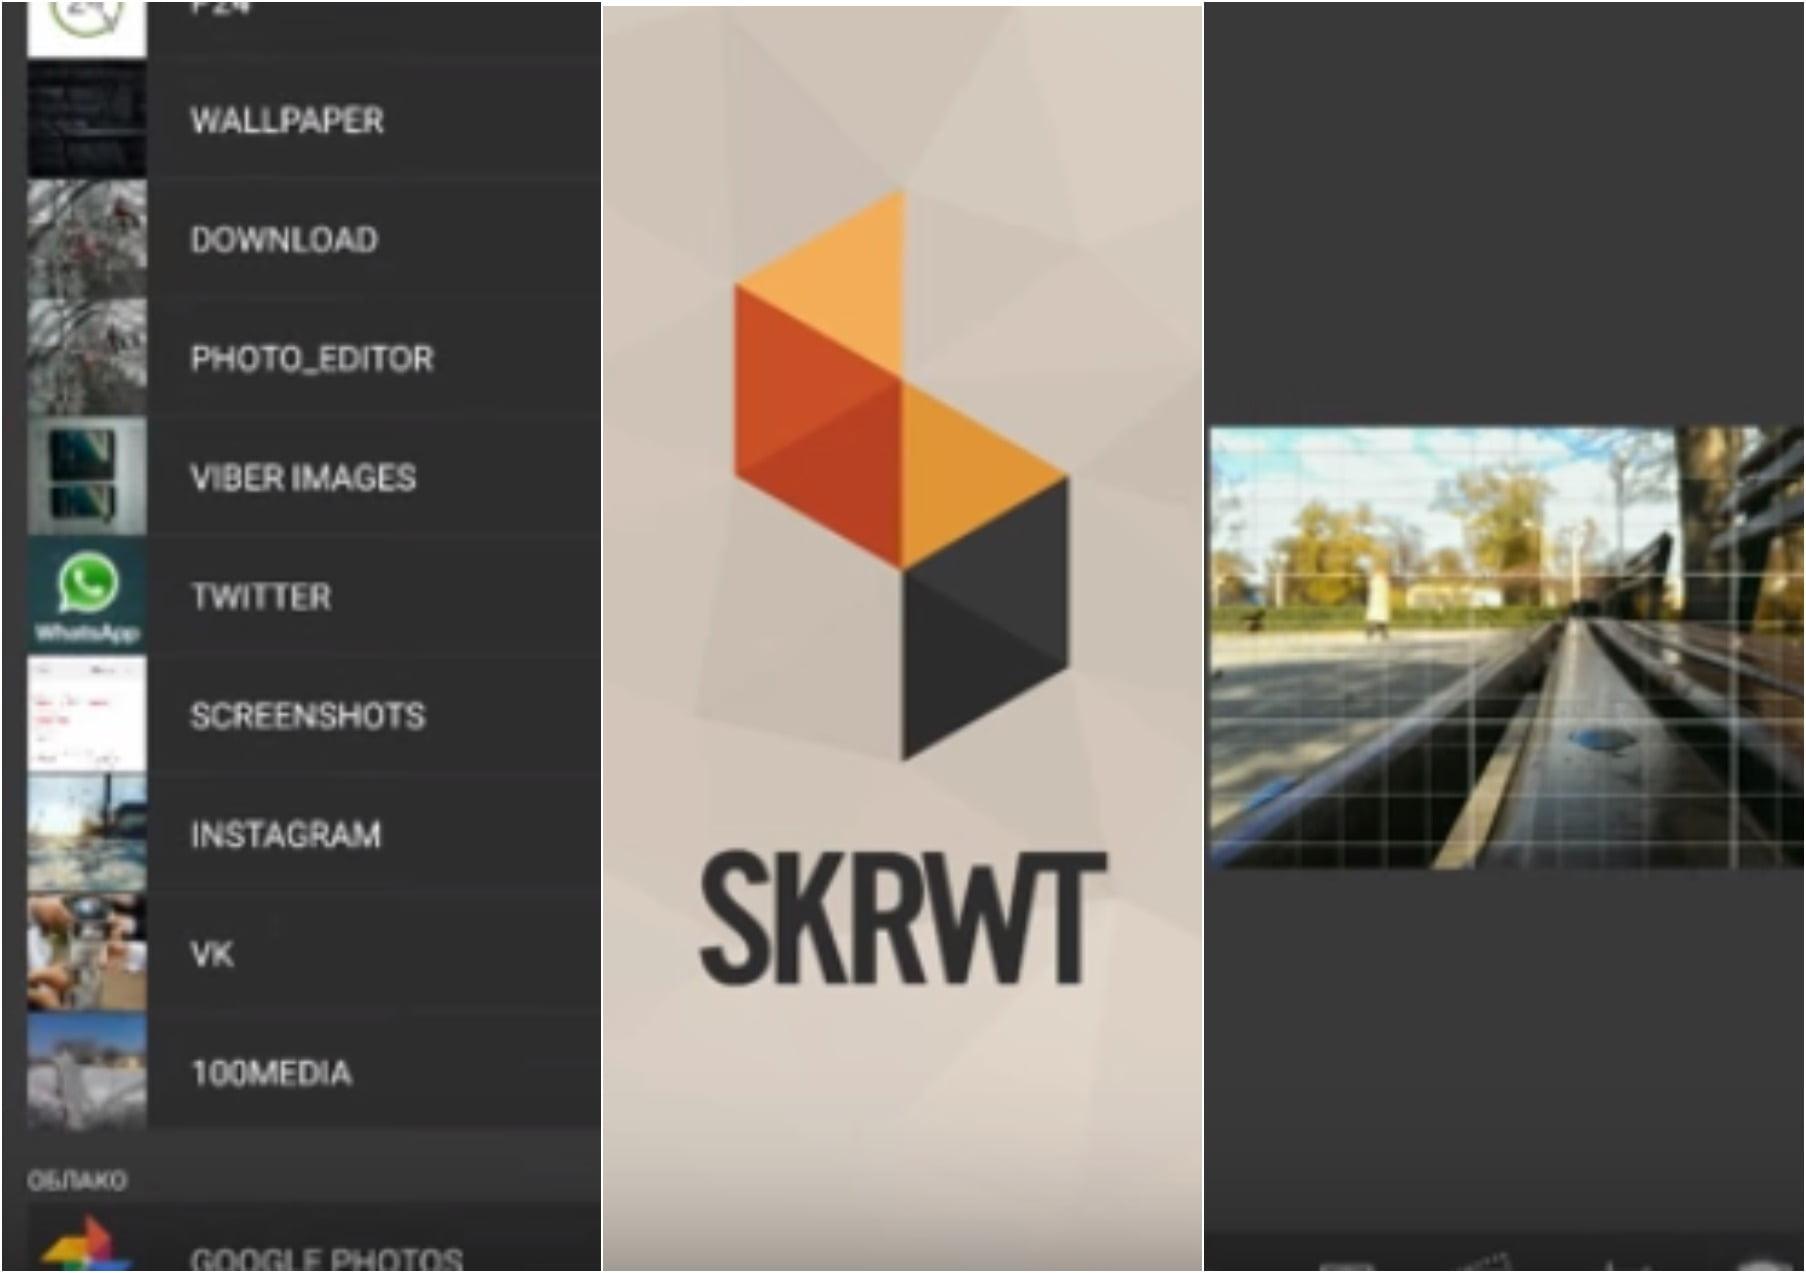 На фото приложение SKRWT